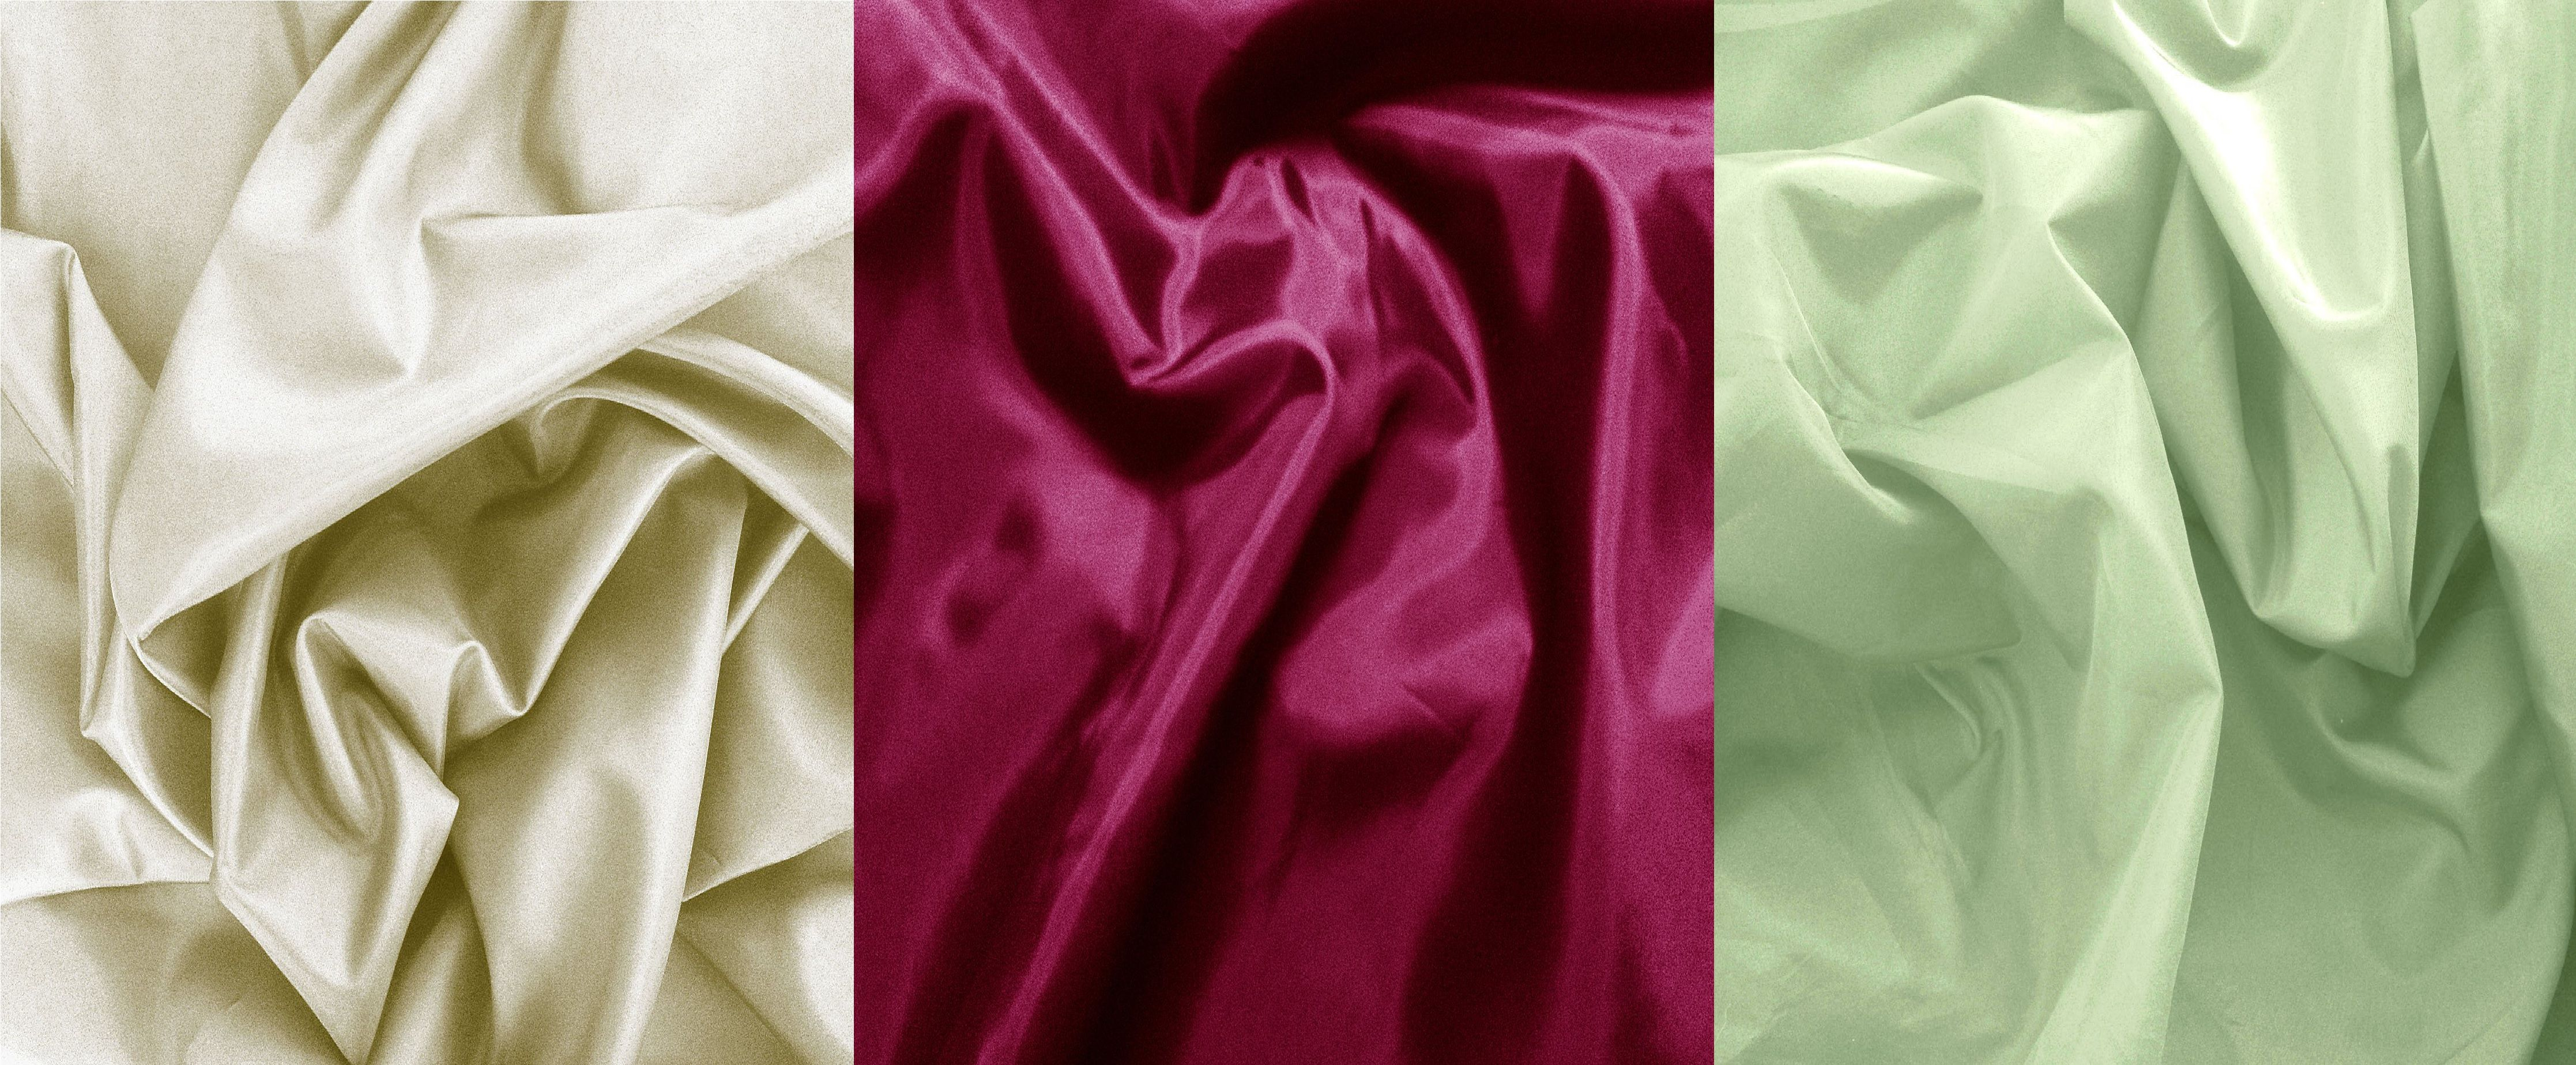 How To Wash Acetate And Triacetate Fabric